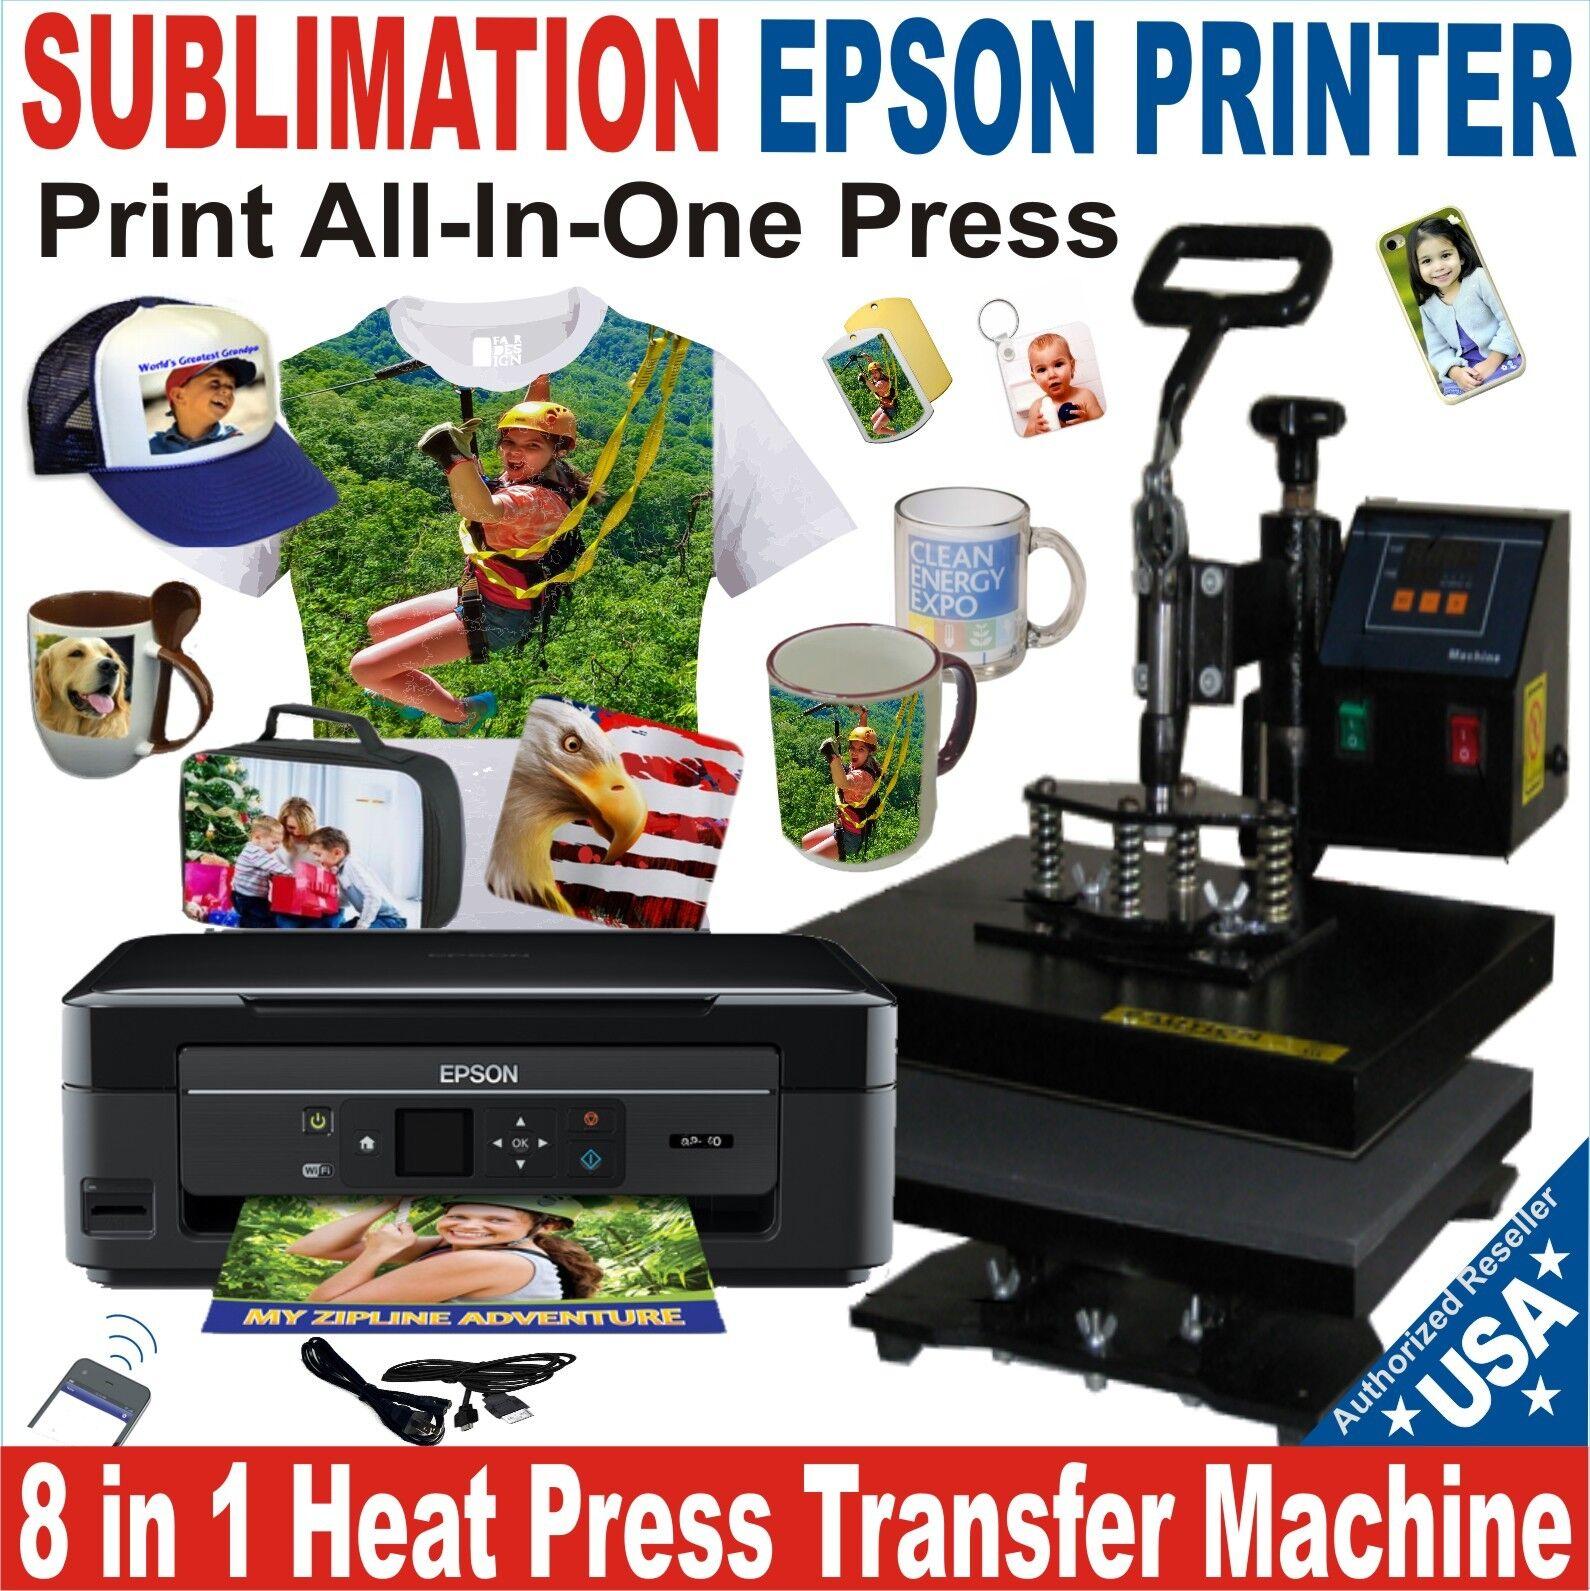 8 In 1 Heat Press Transfer Sublimation Combo Plus Printer...